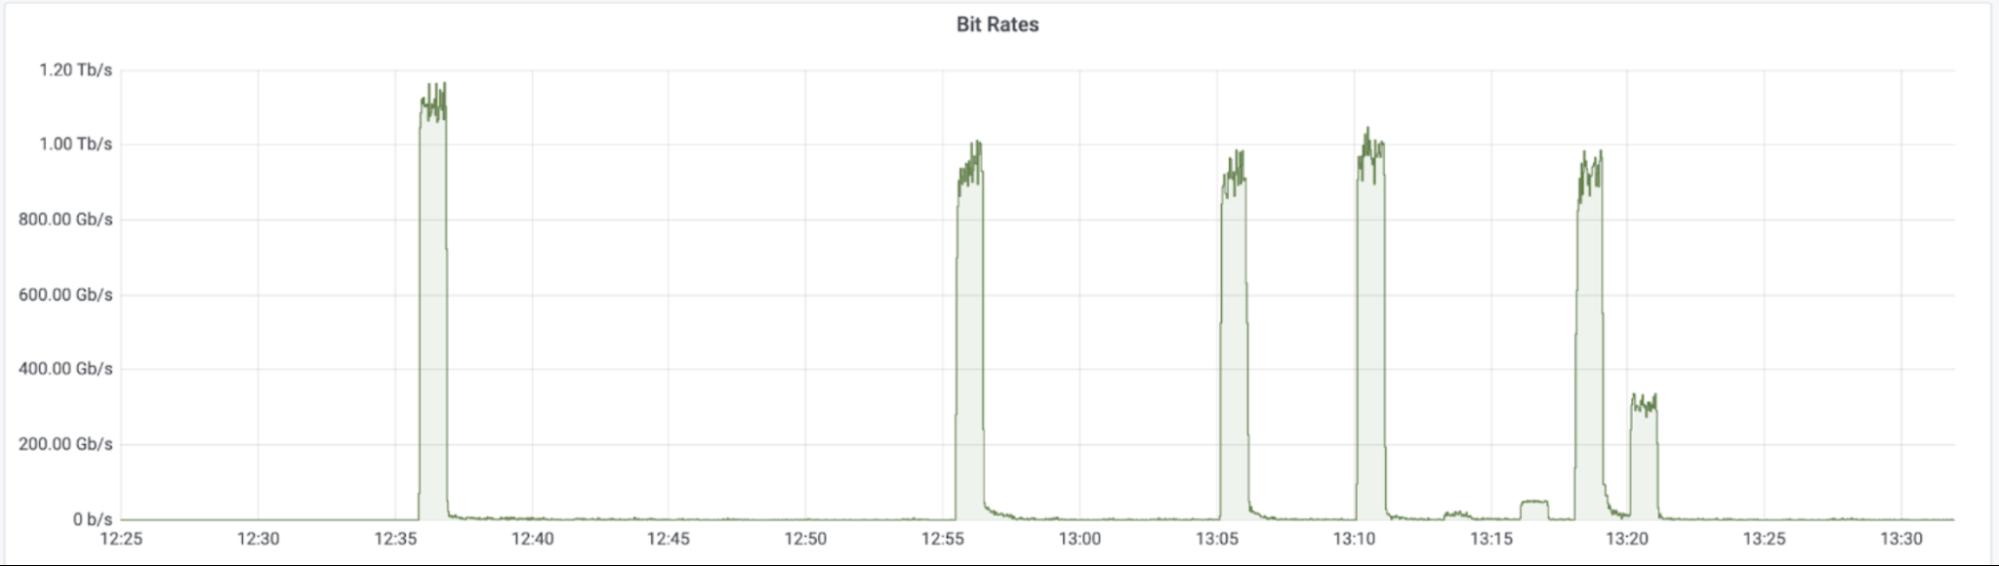 Graph of Mirai botnet attack peaking at 1.2 Tbps